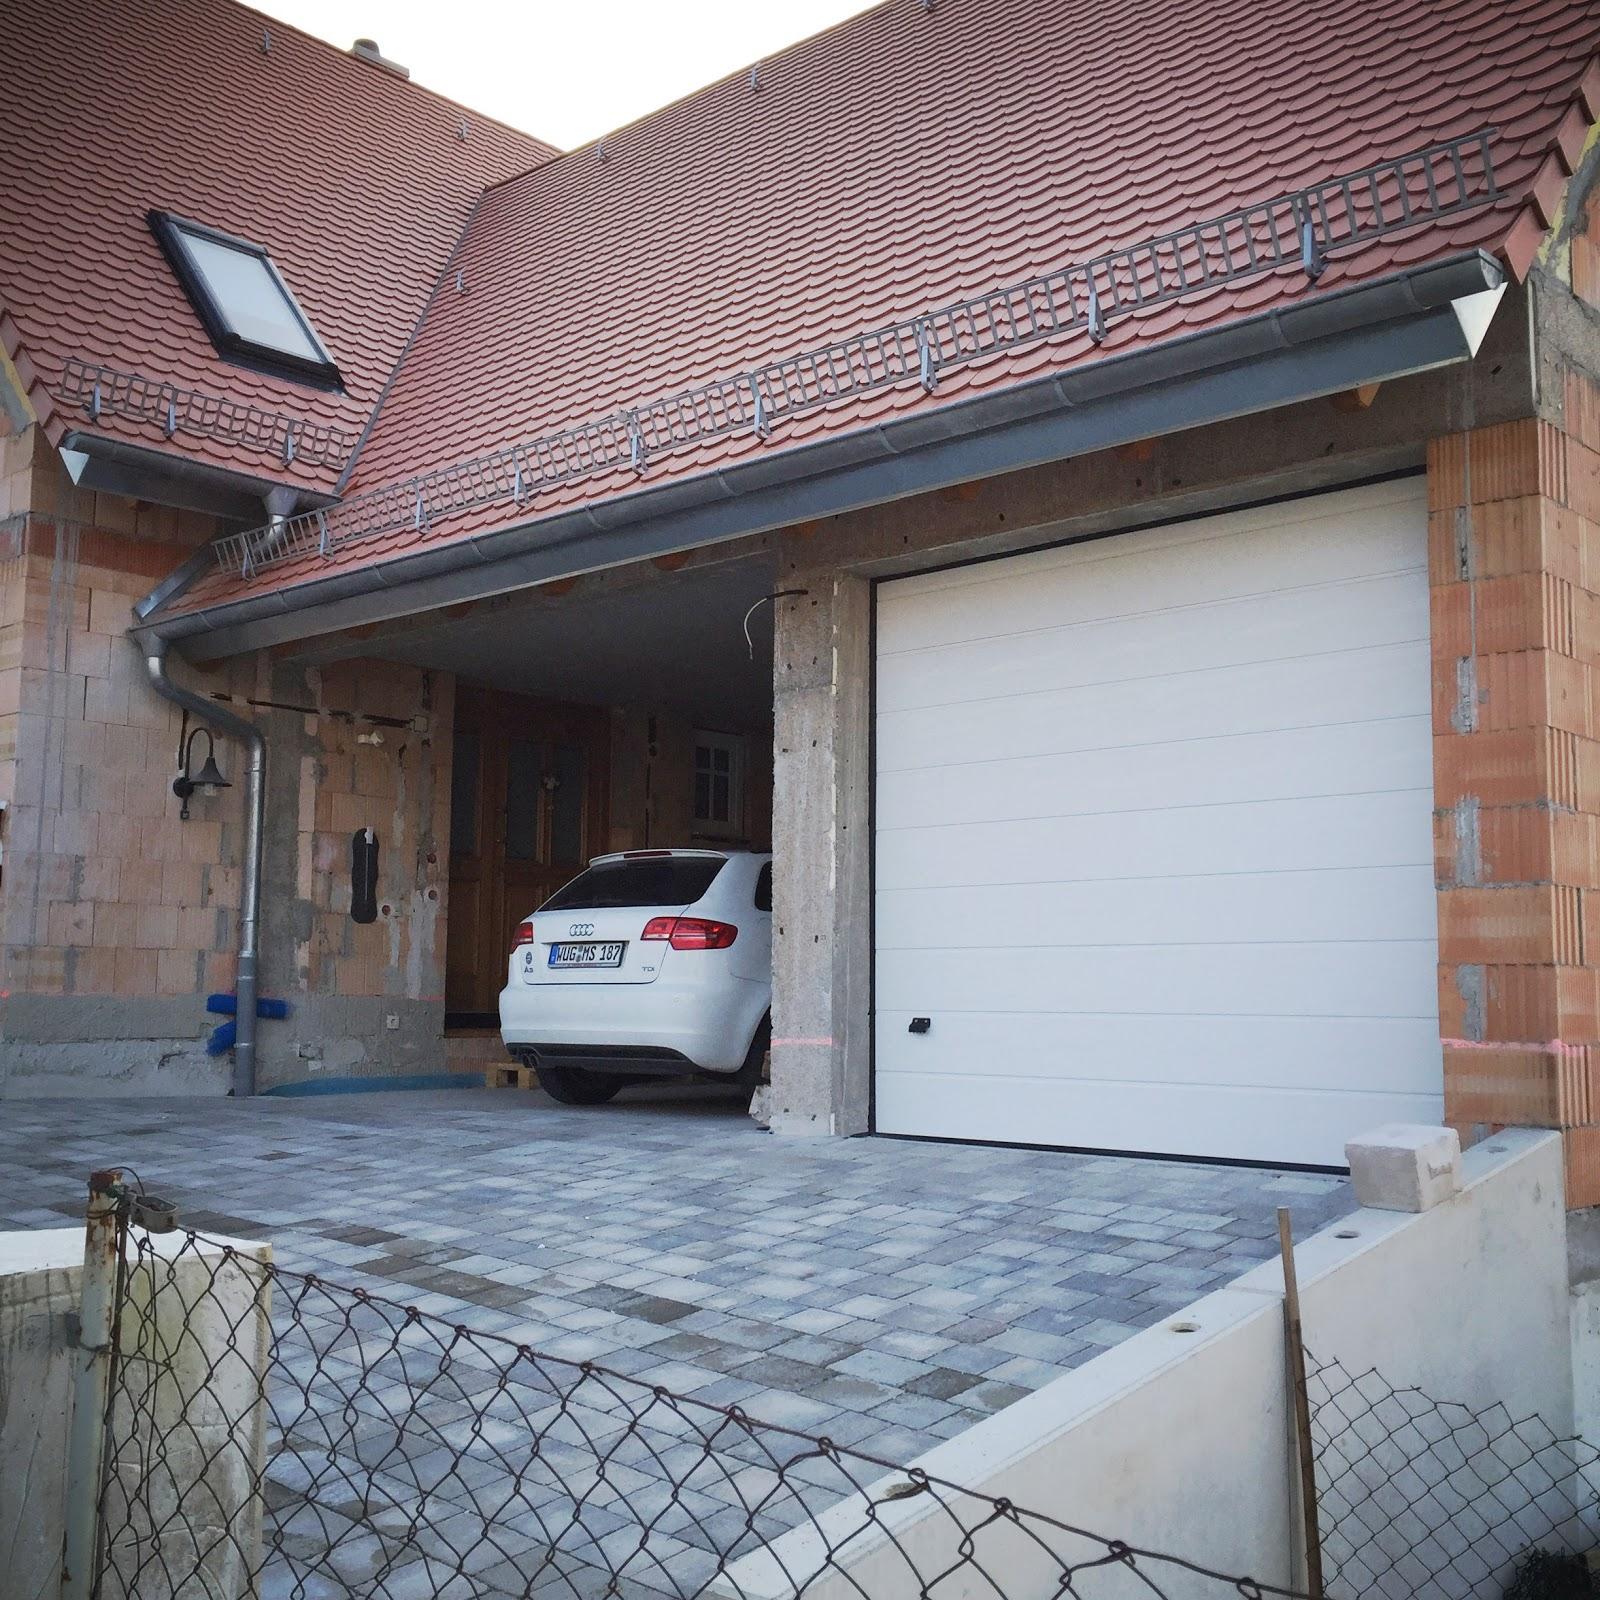 Best Garage Aufräumen Tipps Images - Kosherelsalvador.com ...